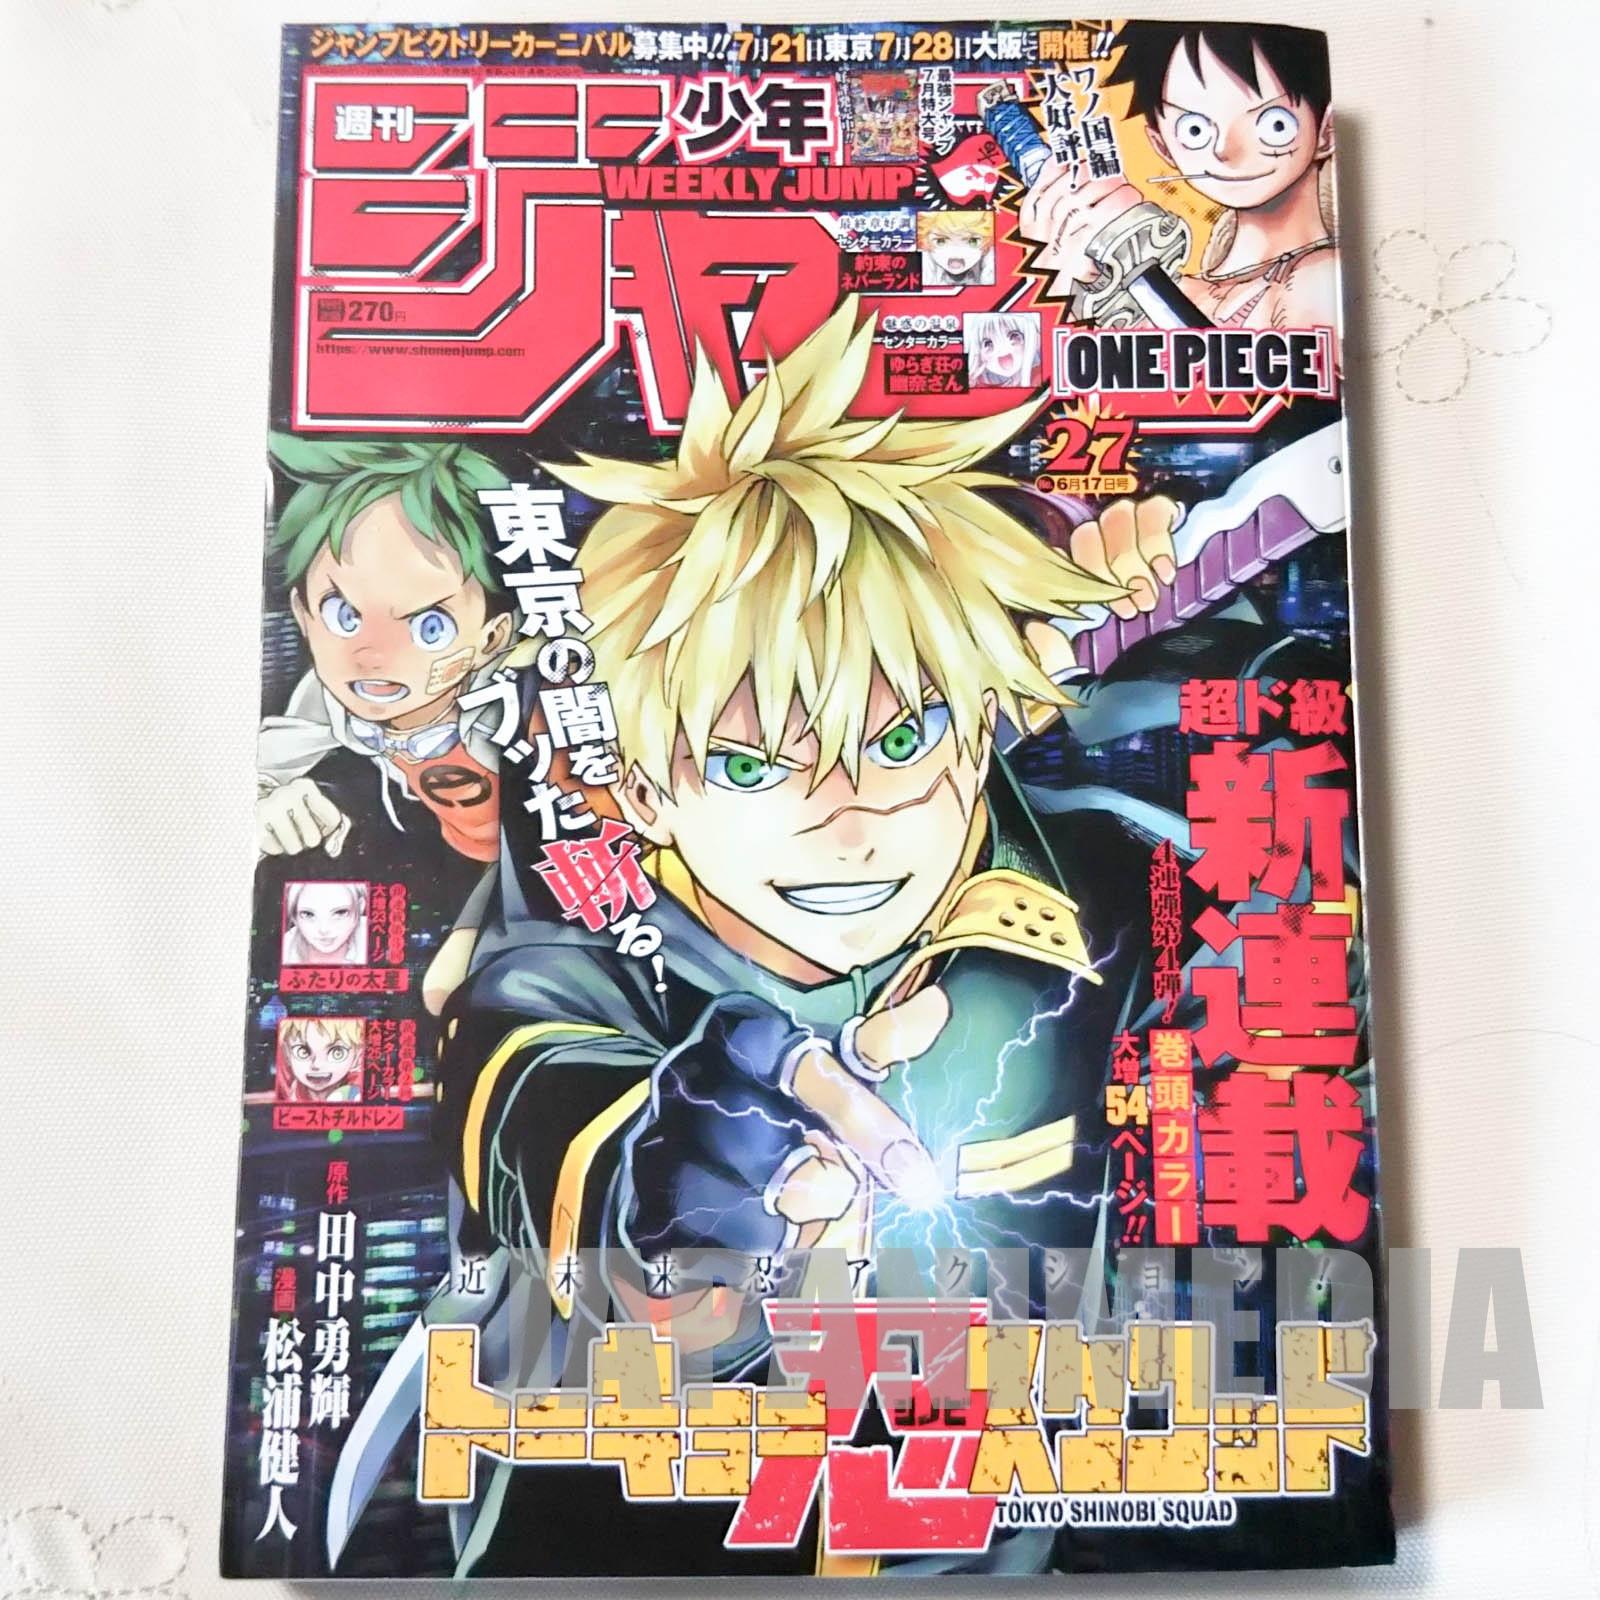 Weekly Shonen JUMP Vol.27 2019 Tokyo Shinobi Squad / Japanese Magazine JAPAN MANGA